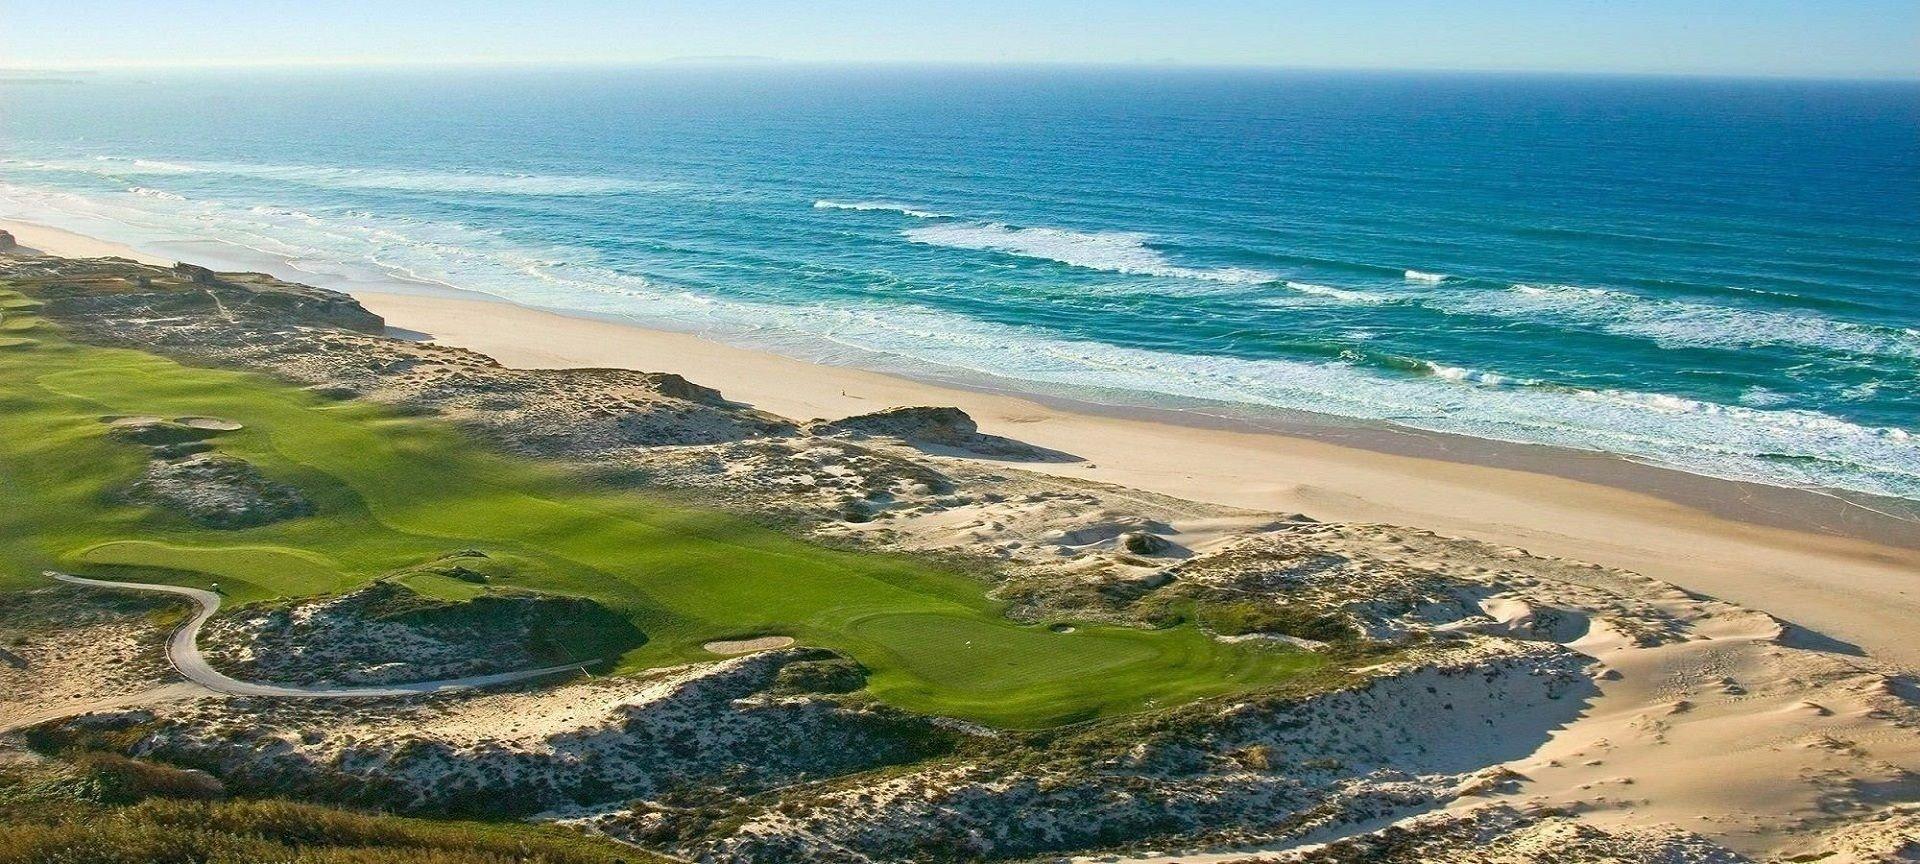 Golfresor Portugal -golfreseguiden.se